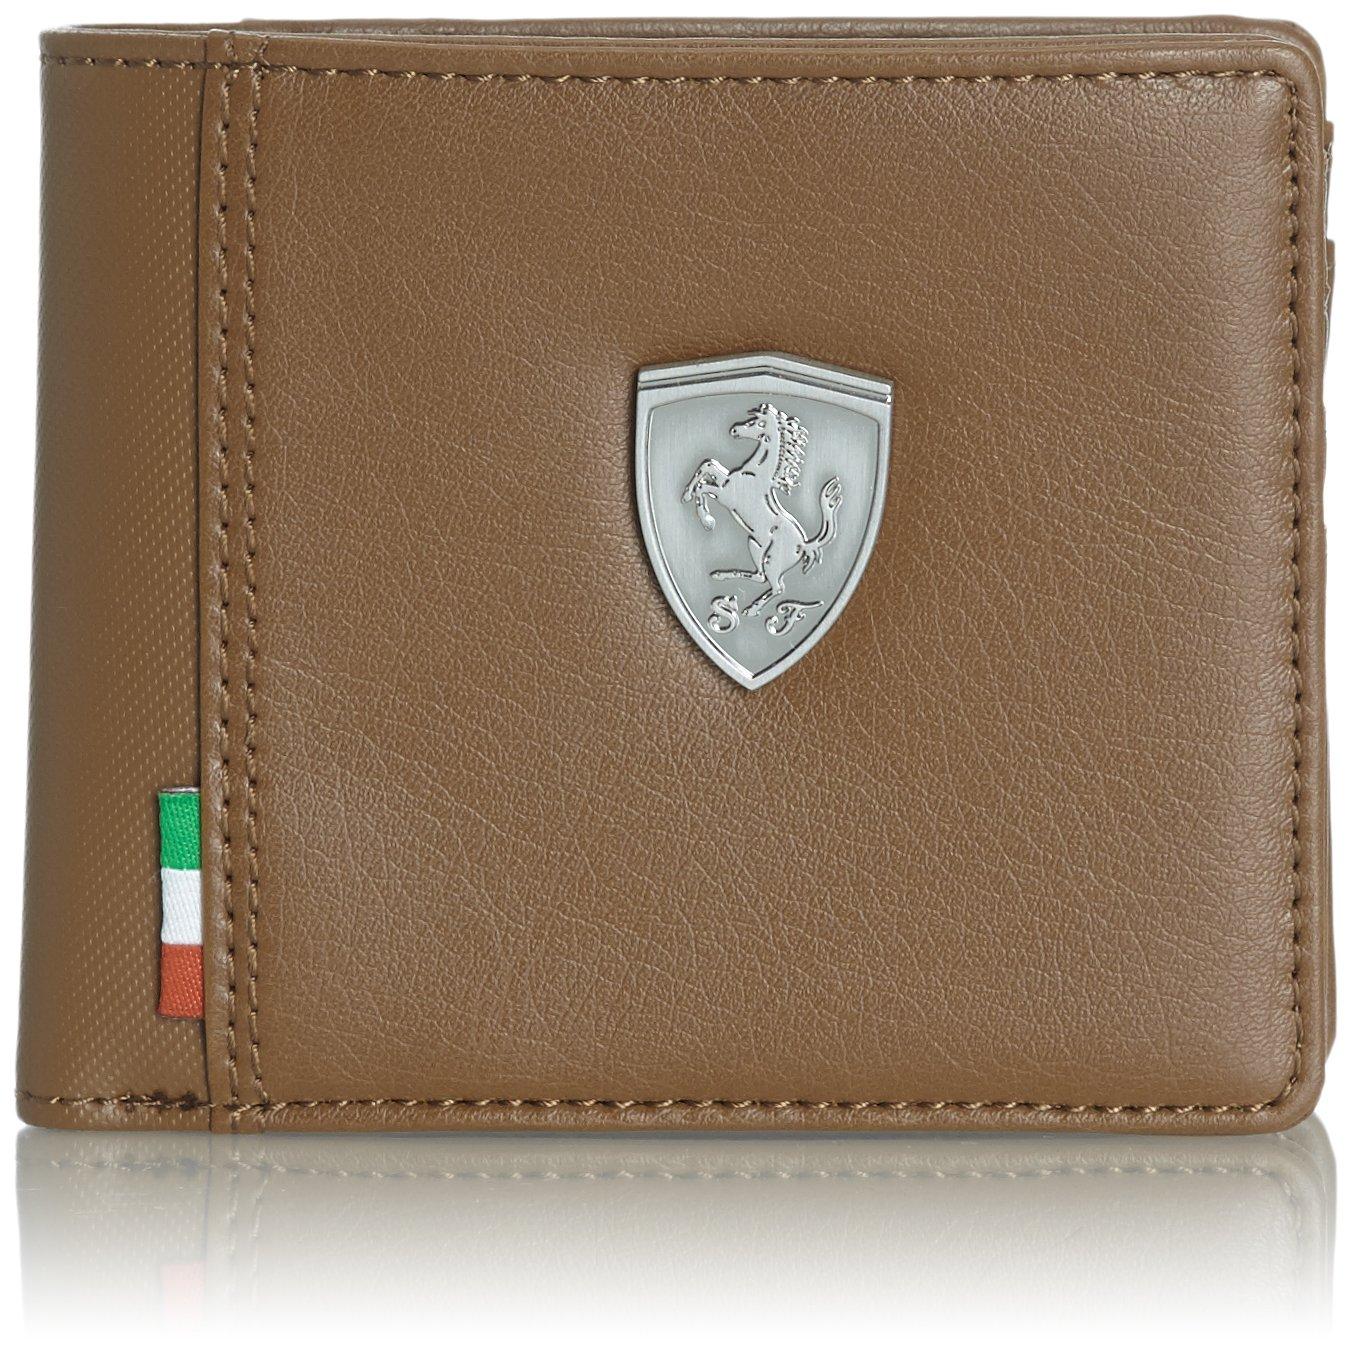 0509b08a8c10 Buy puma ferrari edition wallet - 58% OFF! Share discount